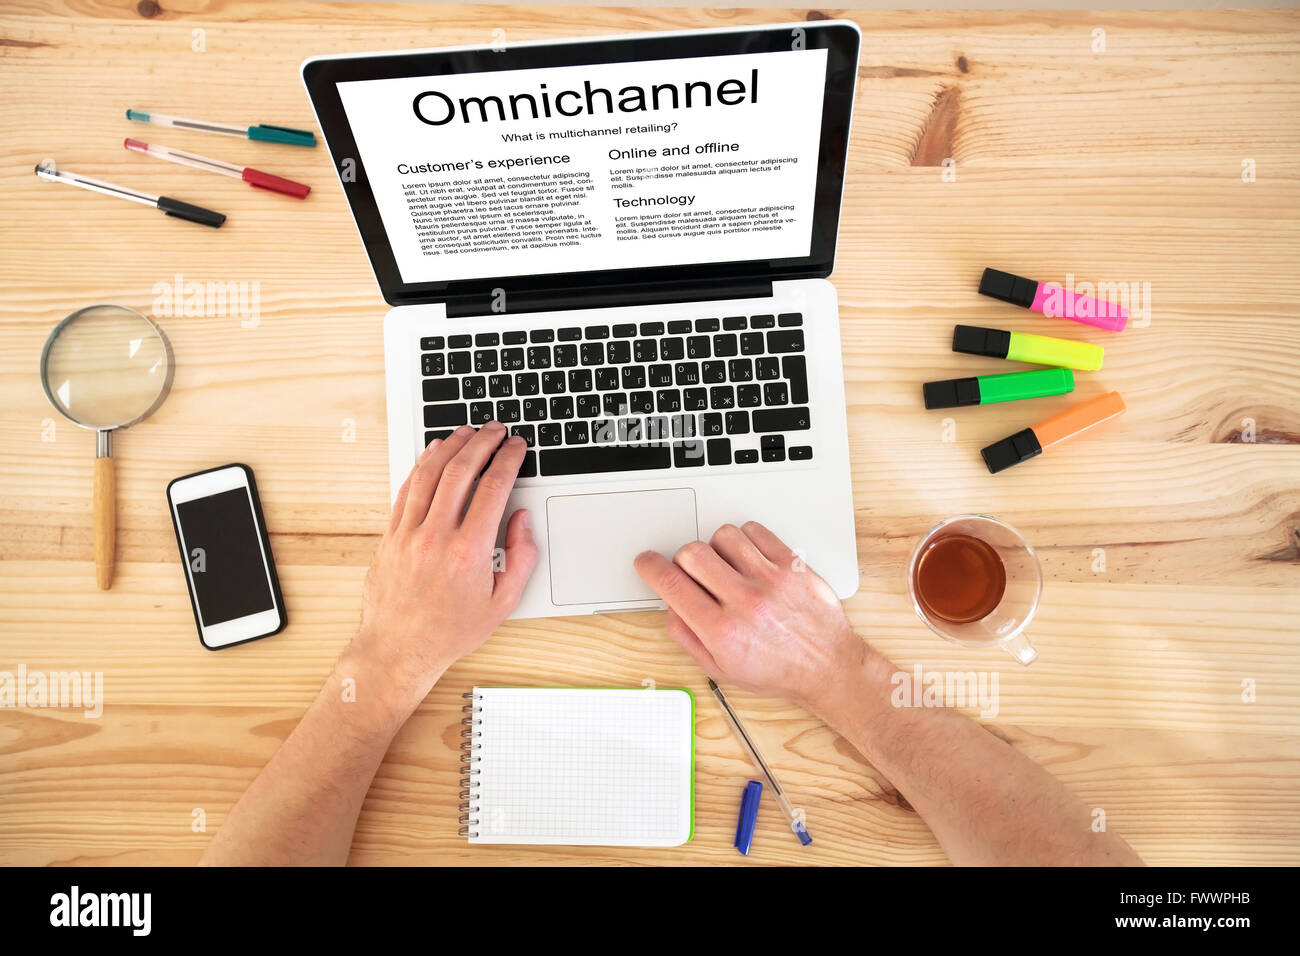 Omnichannel concept, multichannel retailing technology - Stock Image